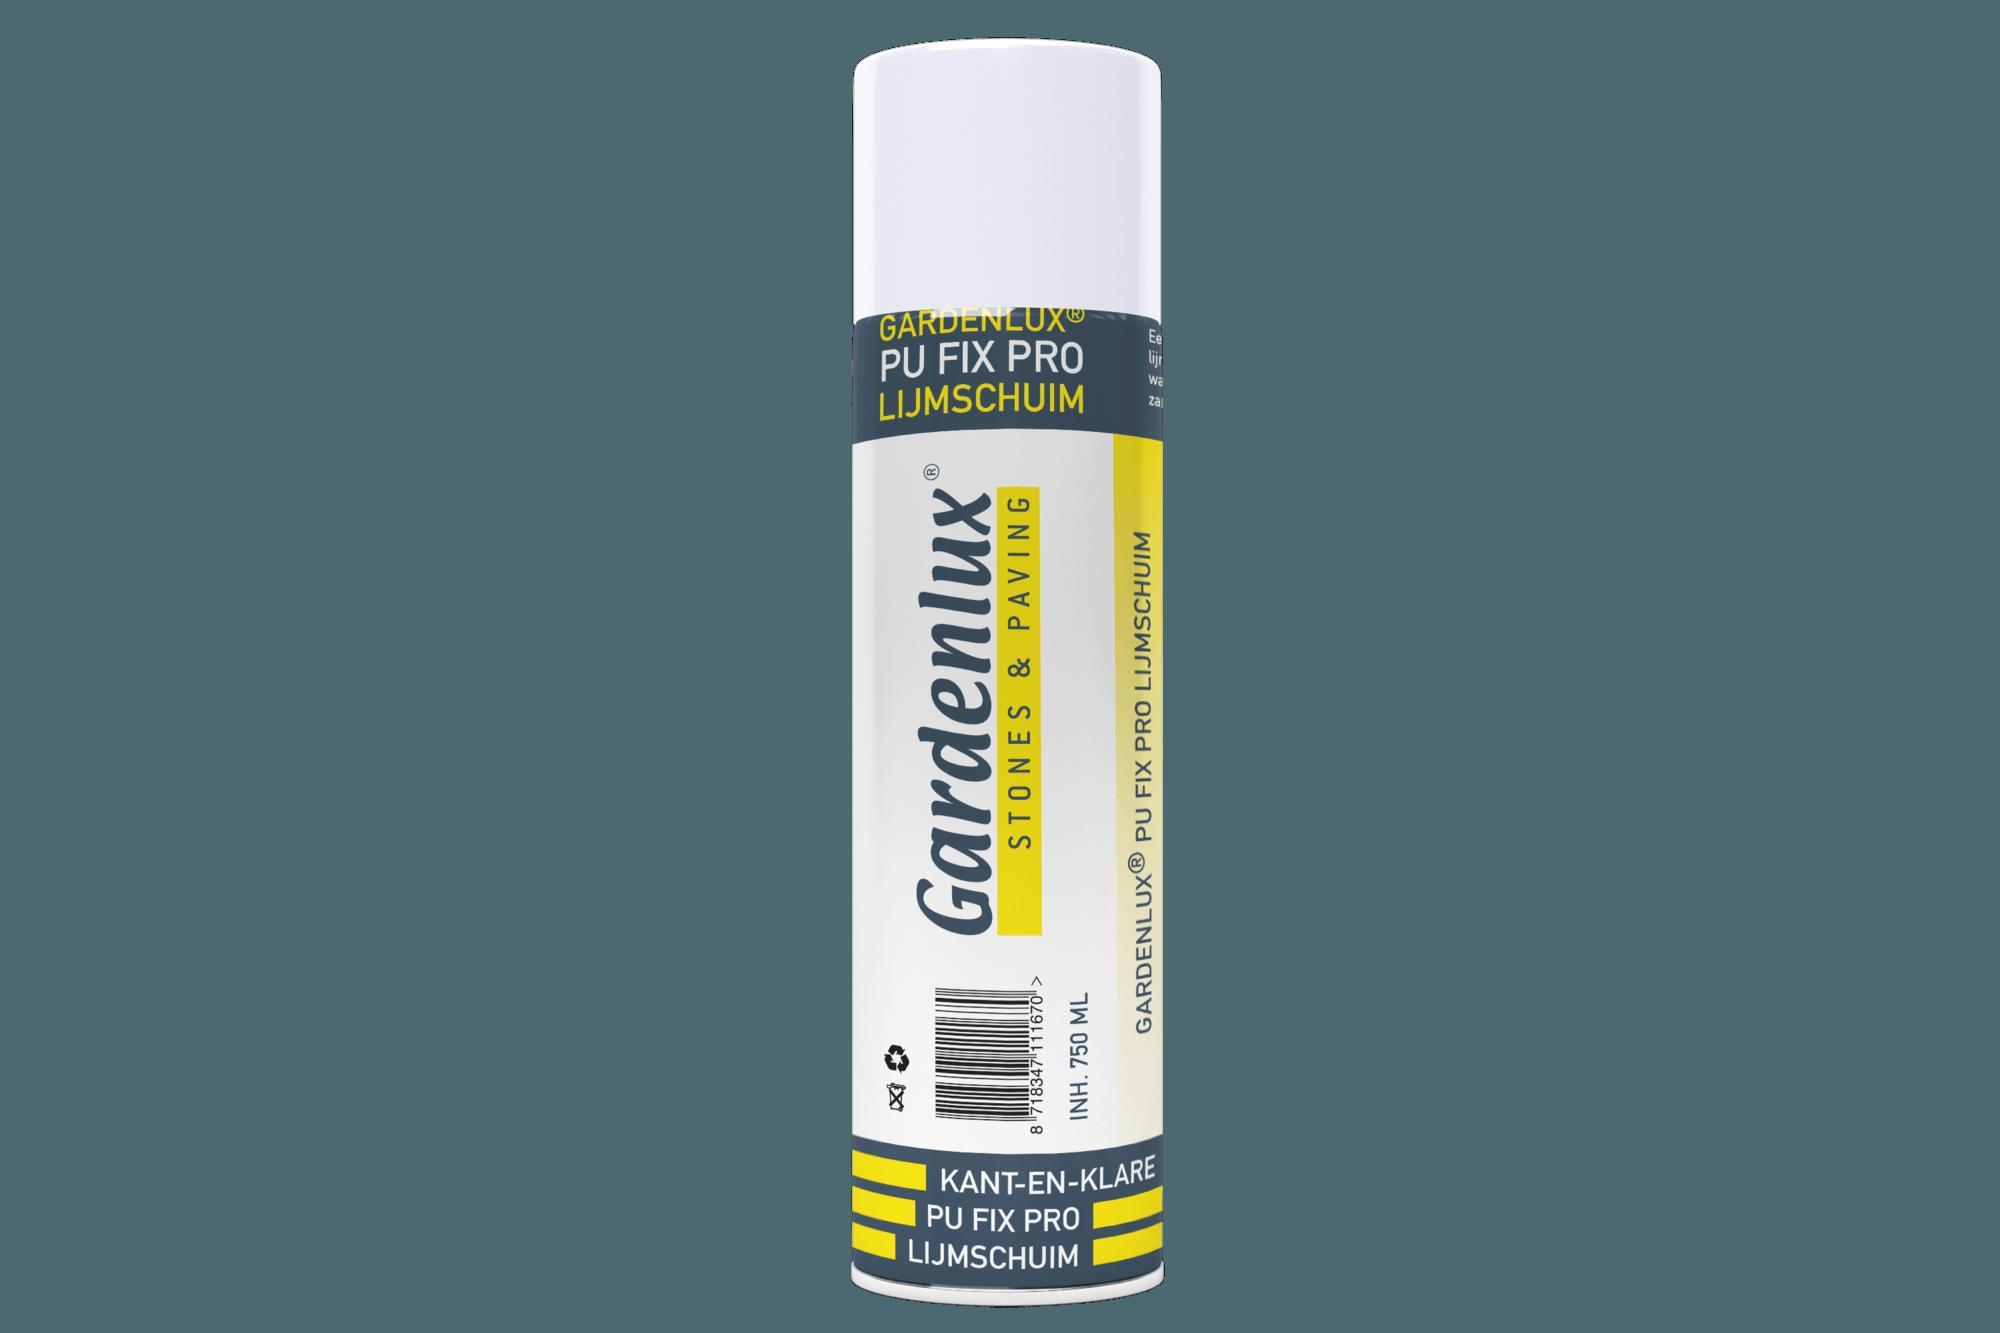 Gardenlux PU Fix Pro Spuitlijm 750ml